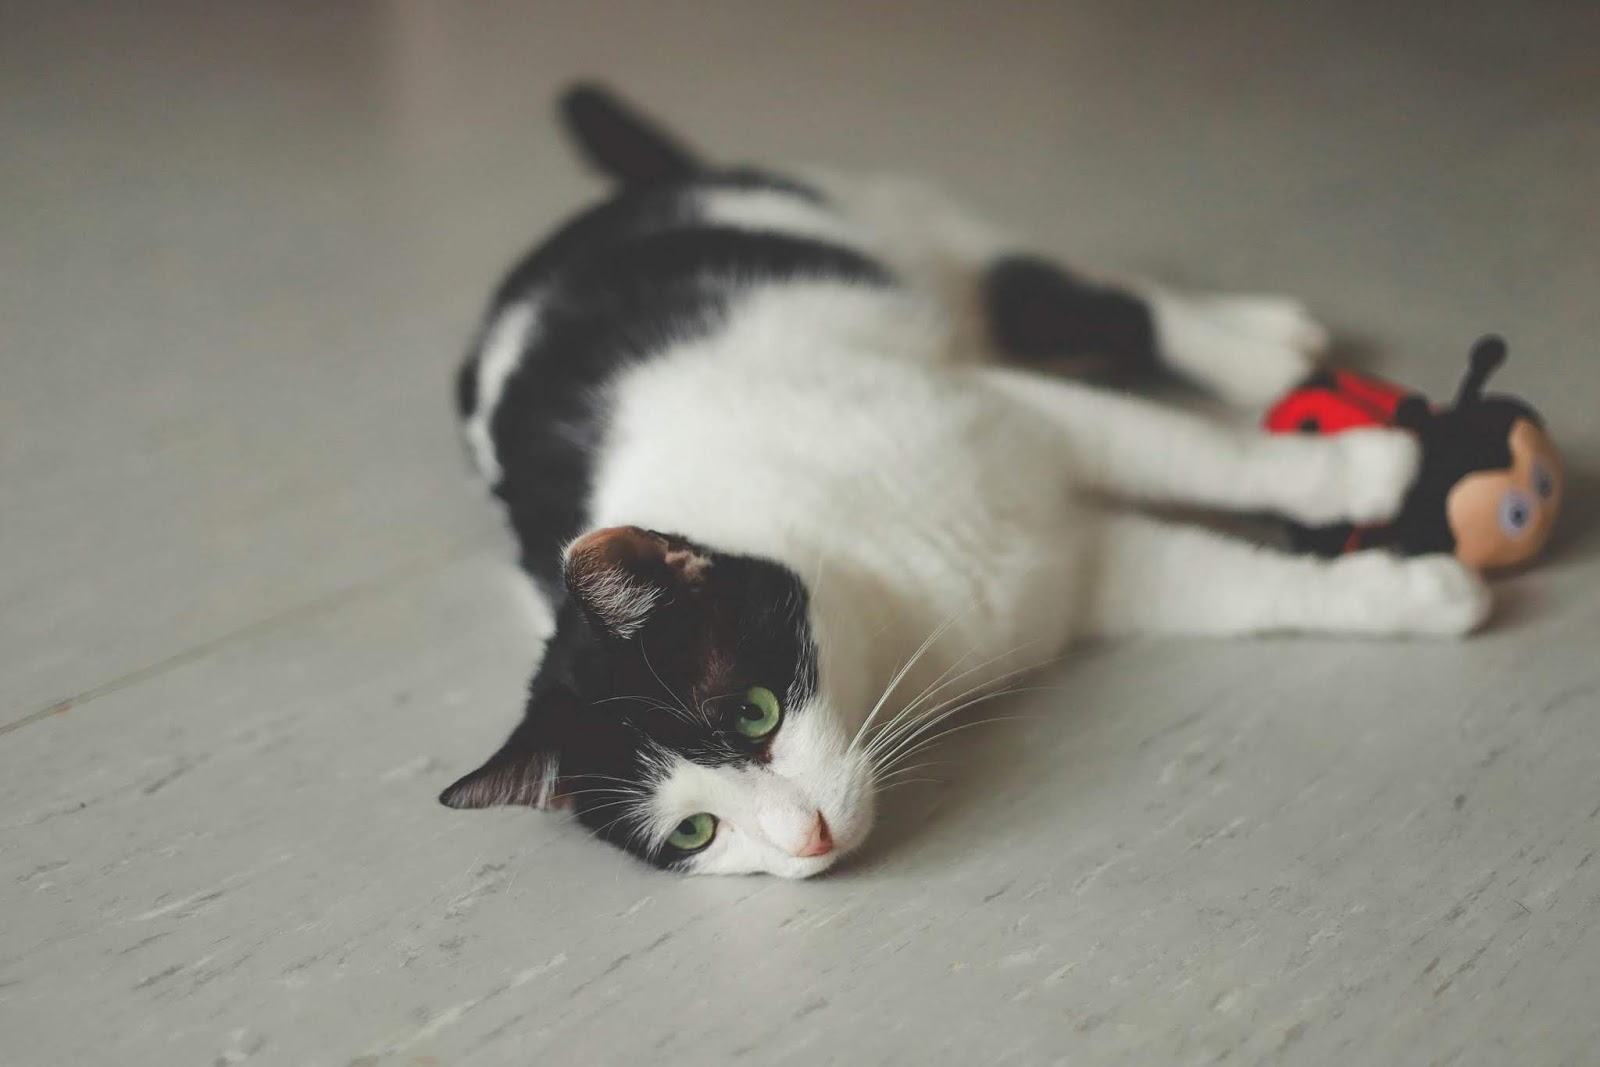 lying white and black cat with ladybug toy on white surface,cat images